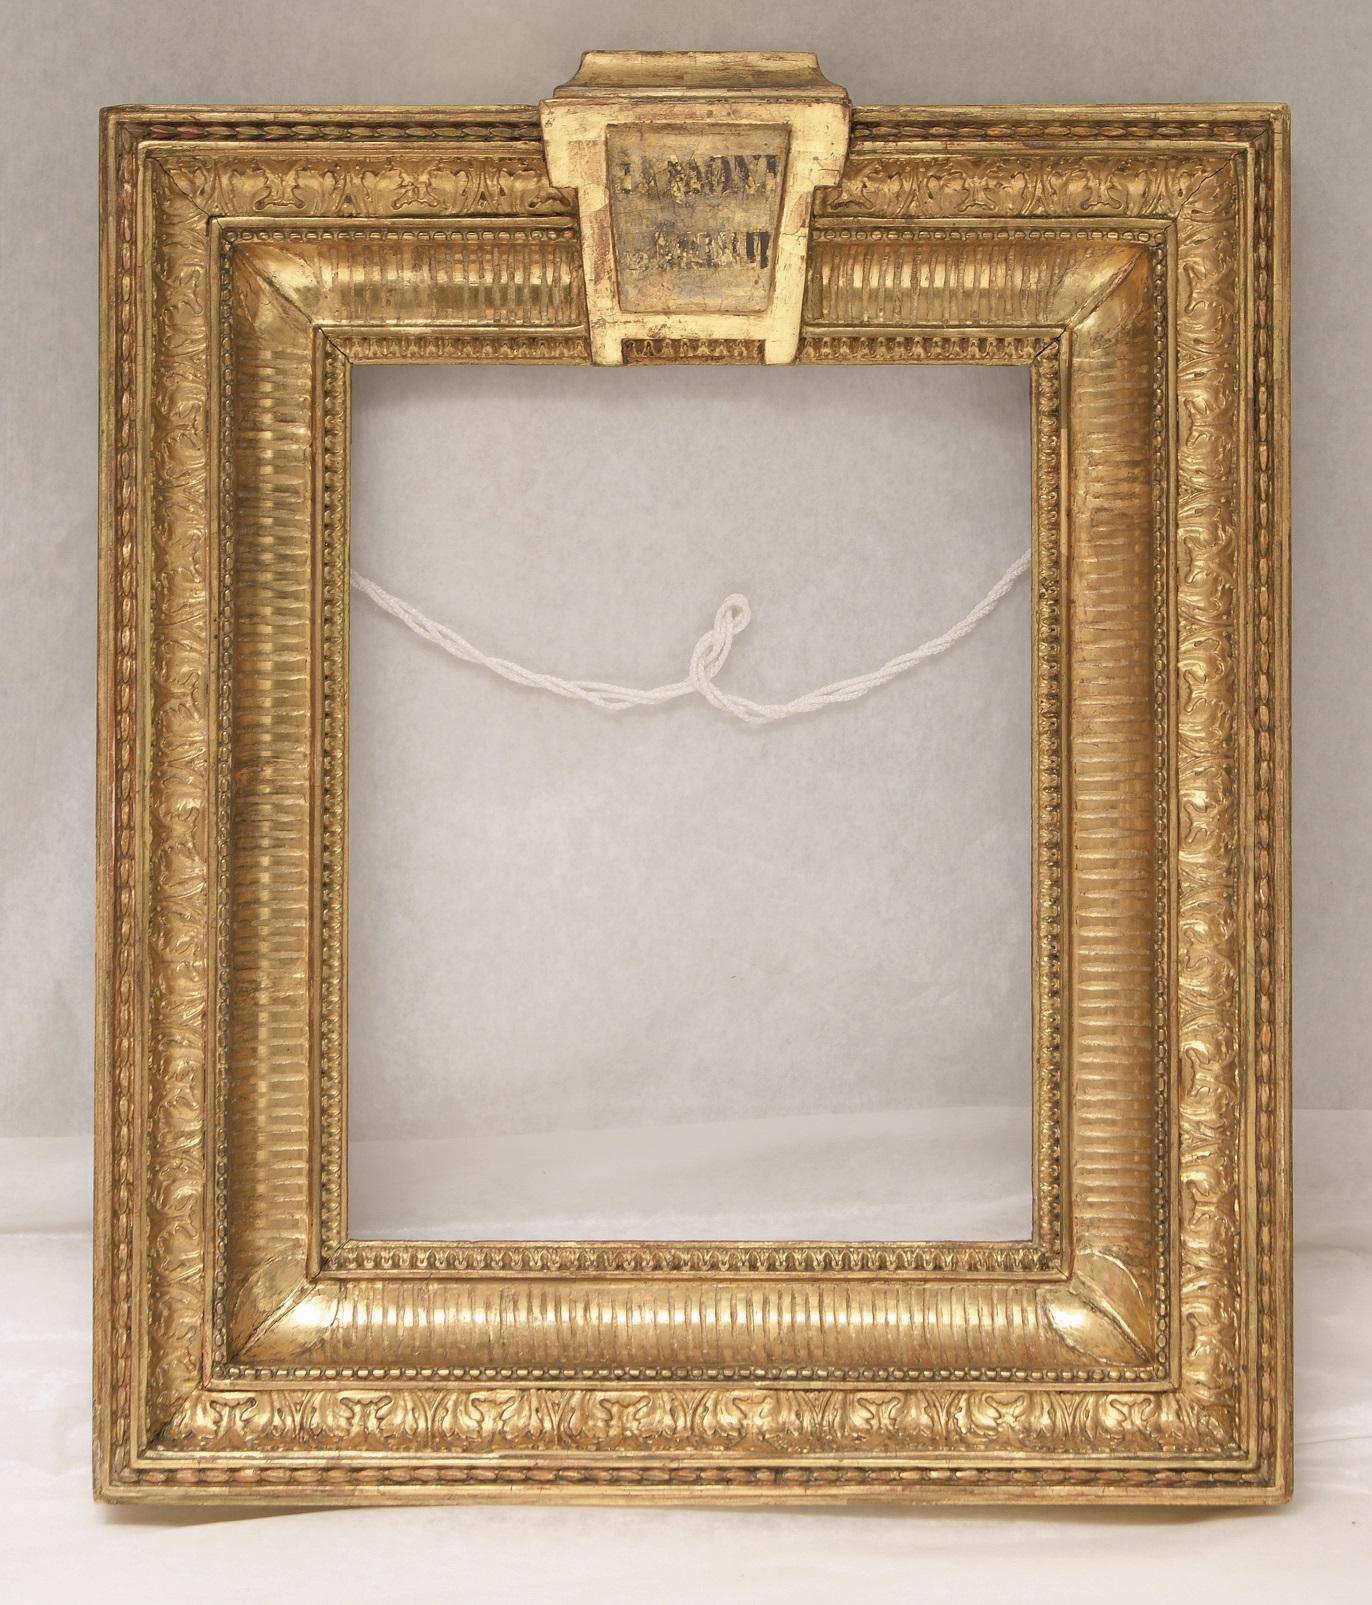 The frame of the Bon Vivant